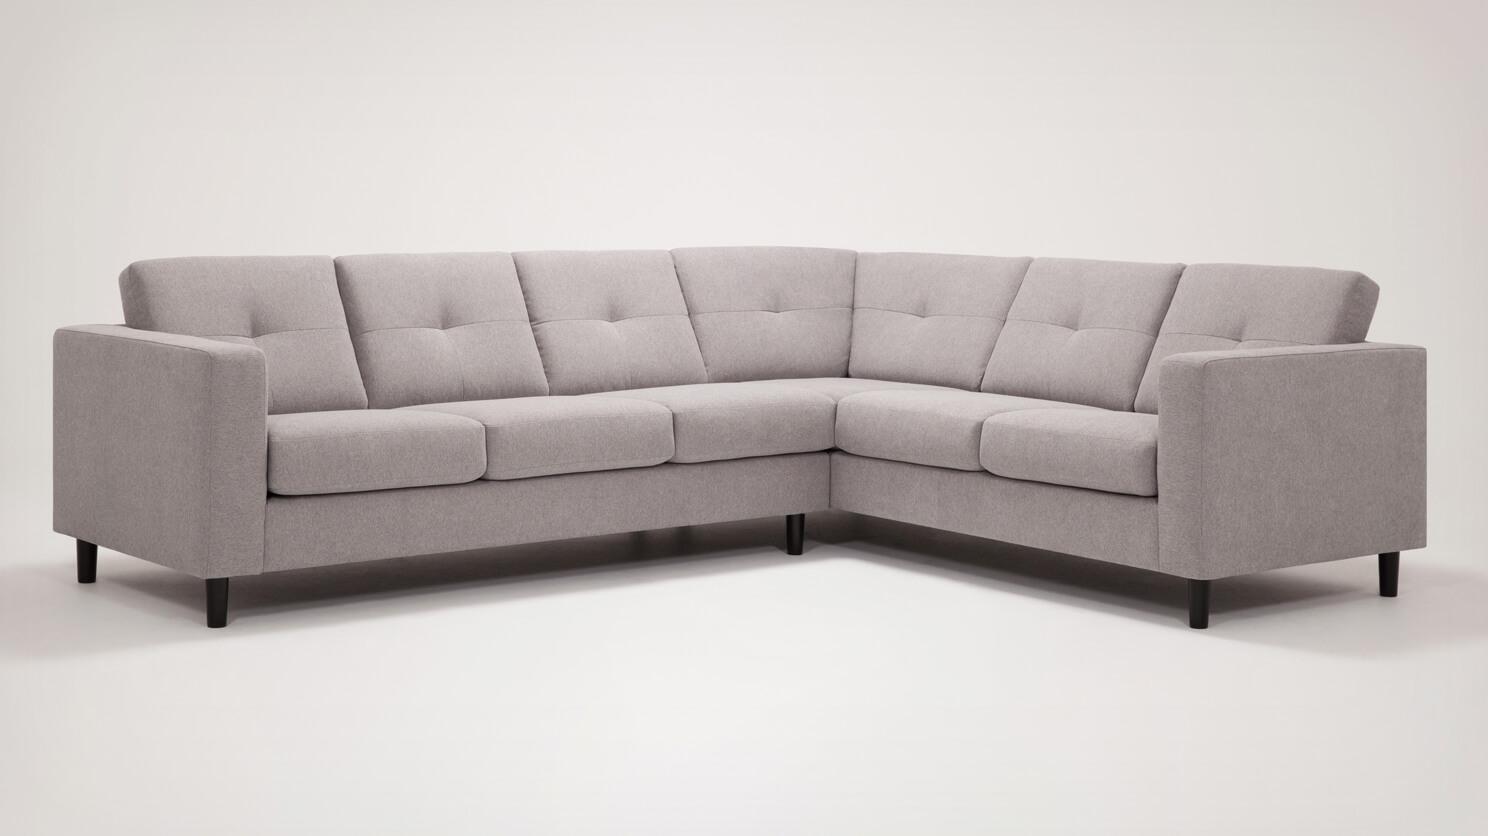 Solo 6-Seat Sectional Sofa - Fabric | EQ3